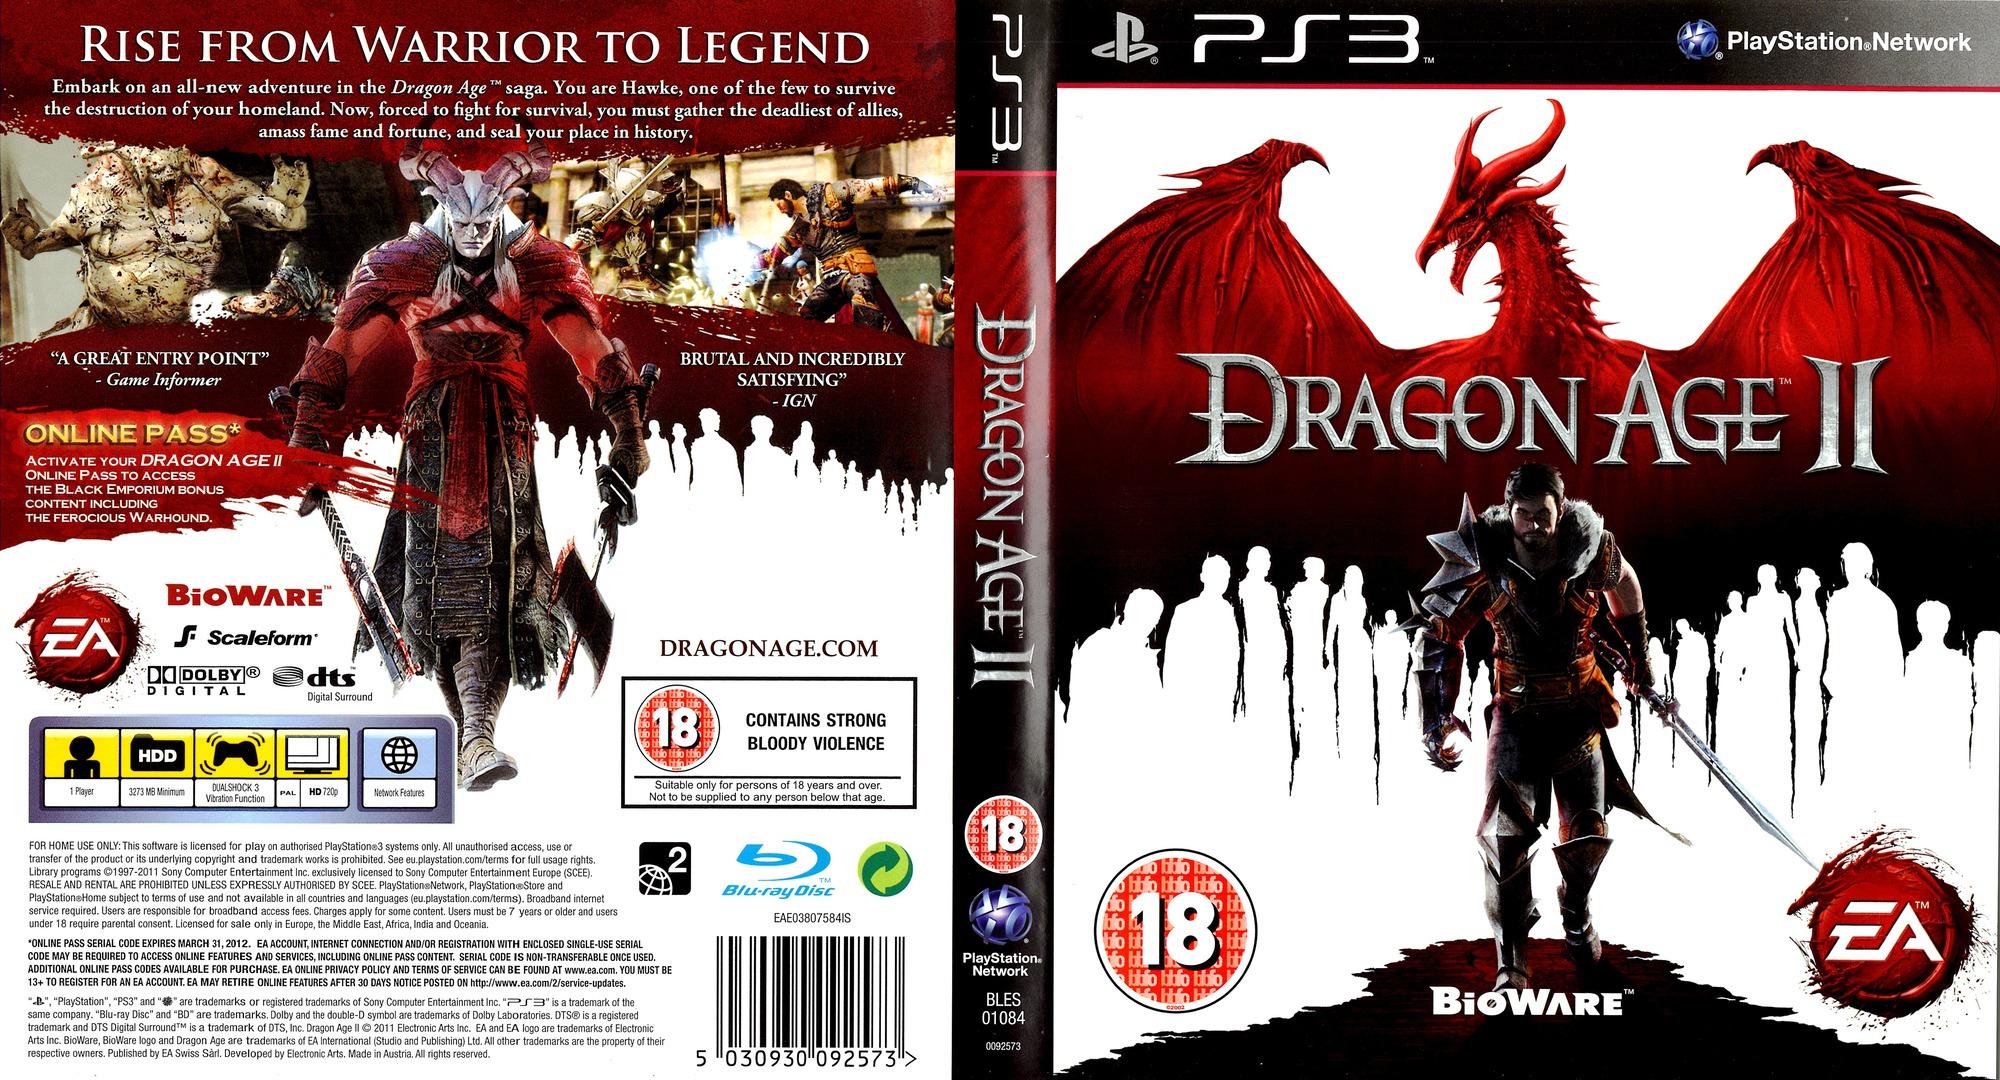 Dragon Age II (Bioware Signature Edition) PS3 coverfullHQB (BLES01084)